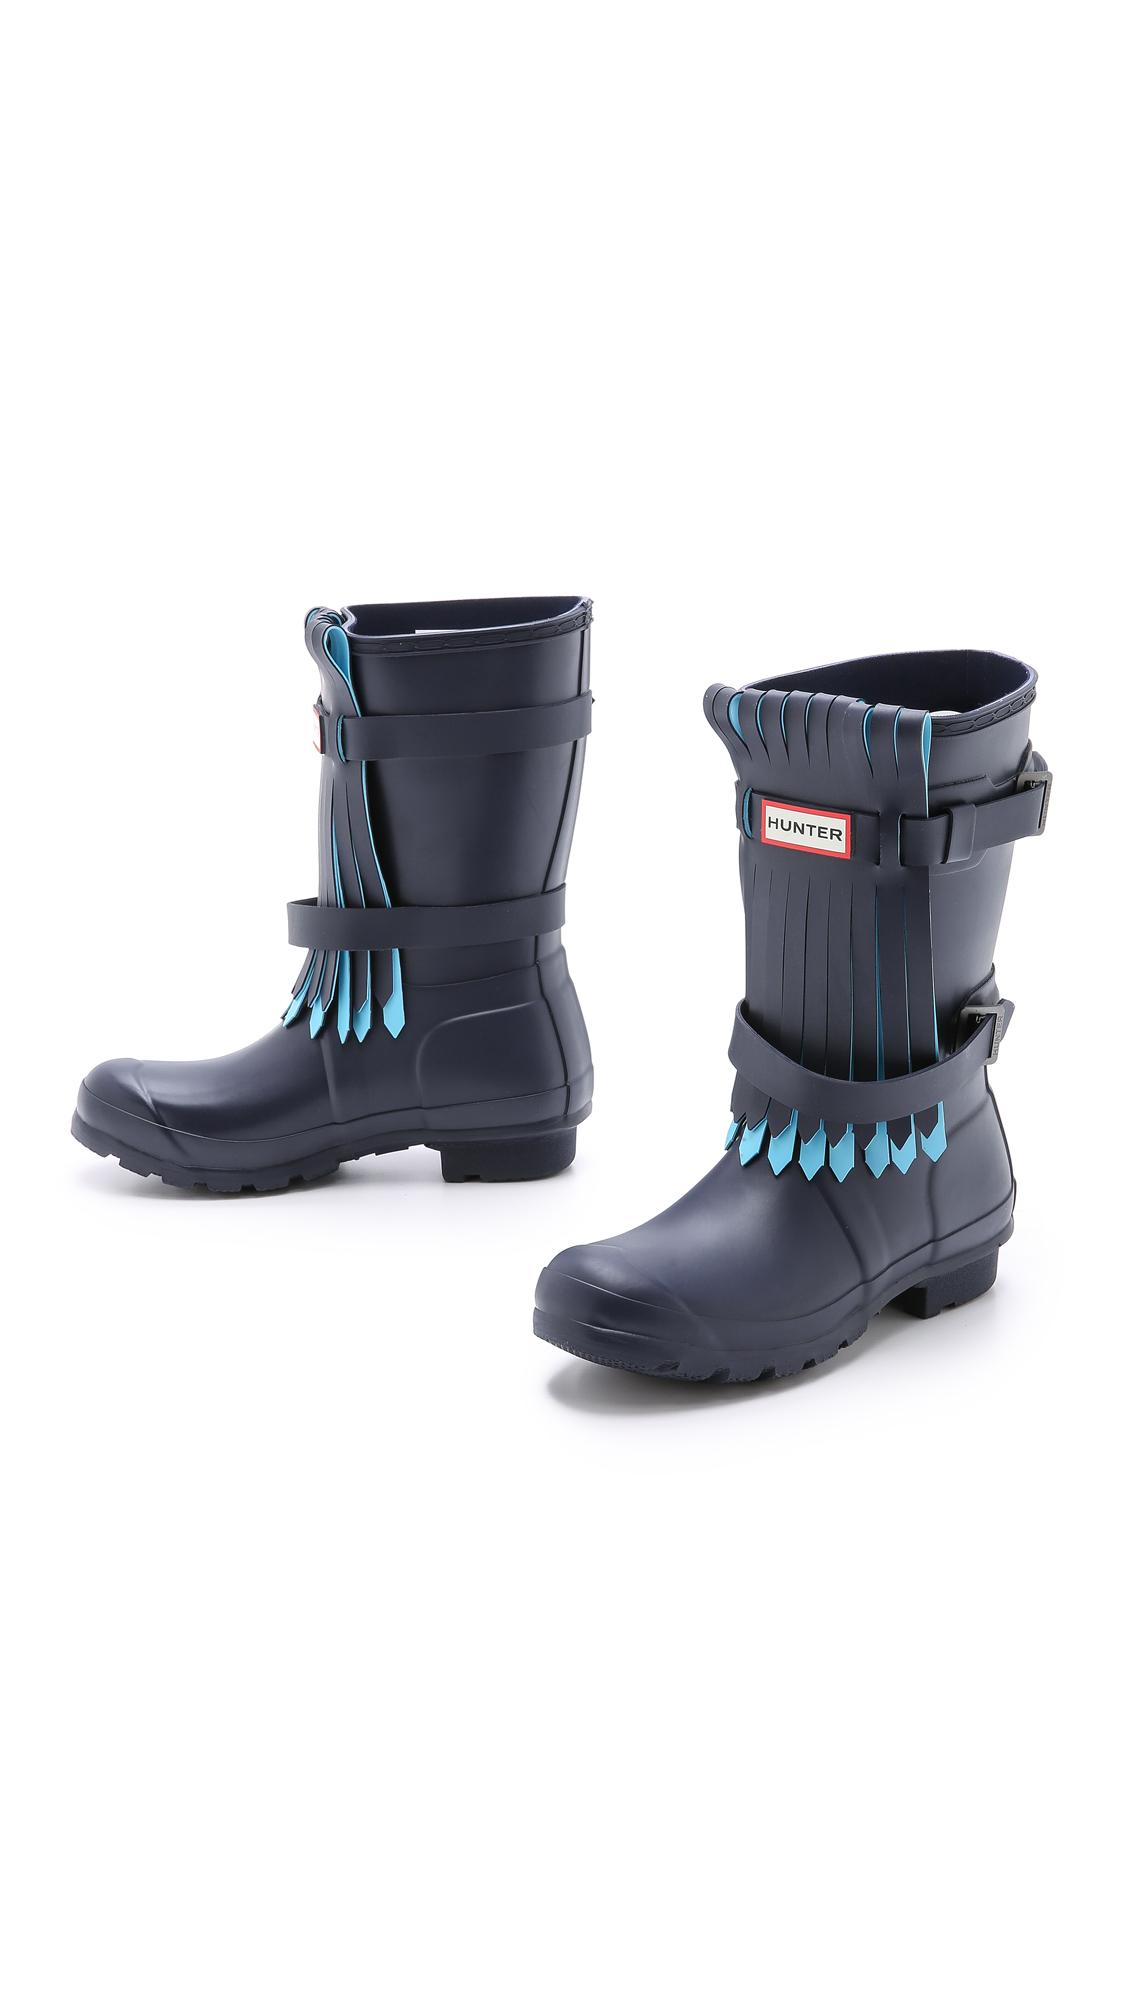 Hunter Original Fringe Short Boots - Black/Dark Slate in ...